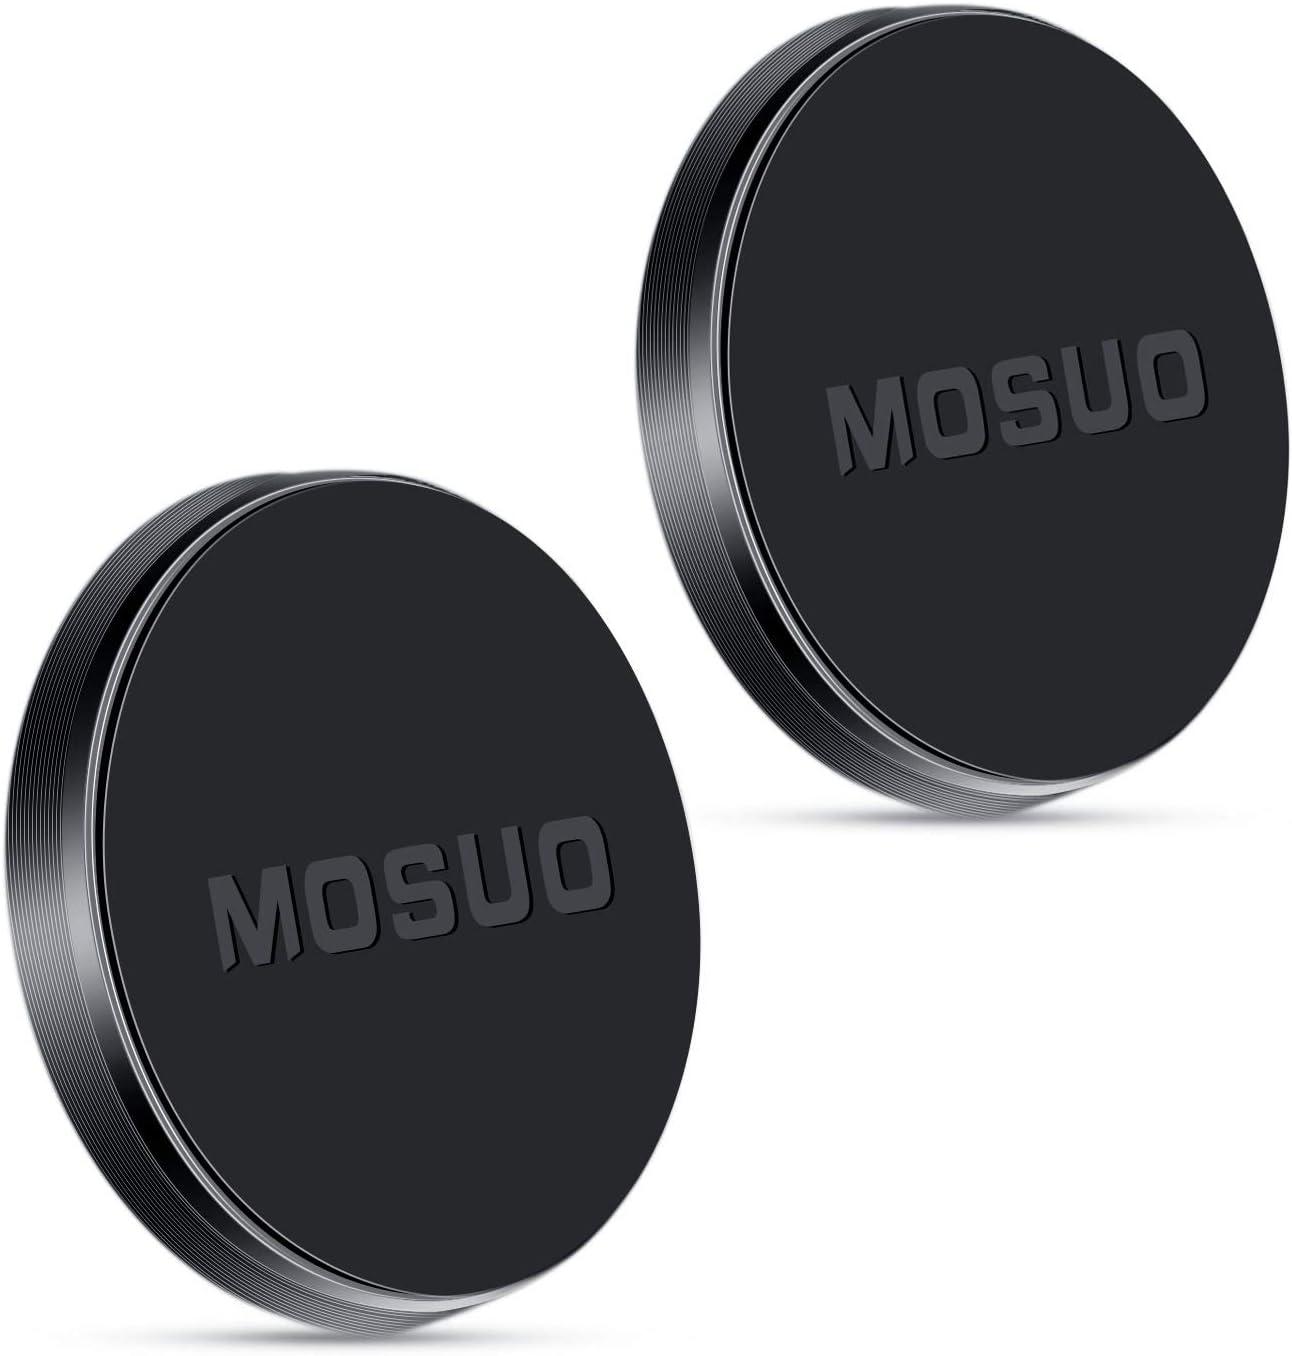 MOSUO 2 Pack Soporte Movil Coche Magnético, Universal Iman para movil Coche para Salpicadero/Pared/Superficies Planas, Soporte Teléfono Coche para iPhone/Samsung/Echo Dot/LG/GPS -Negro